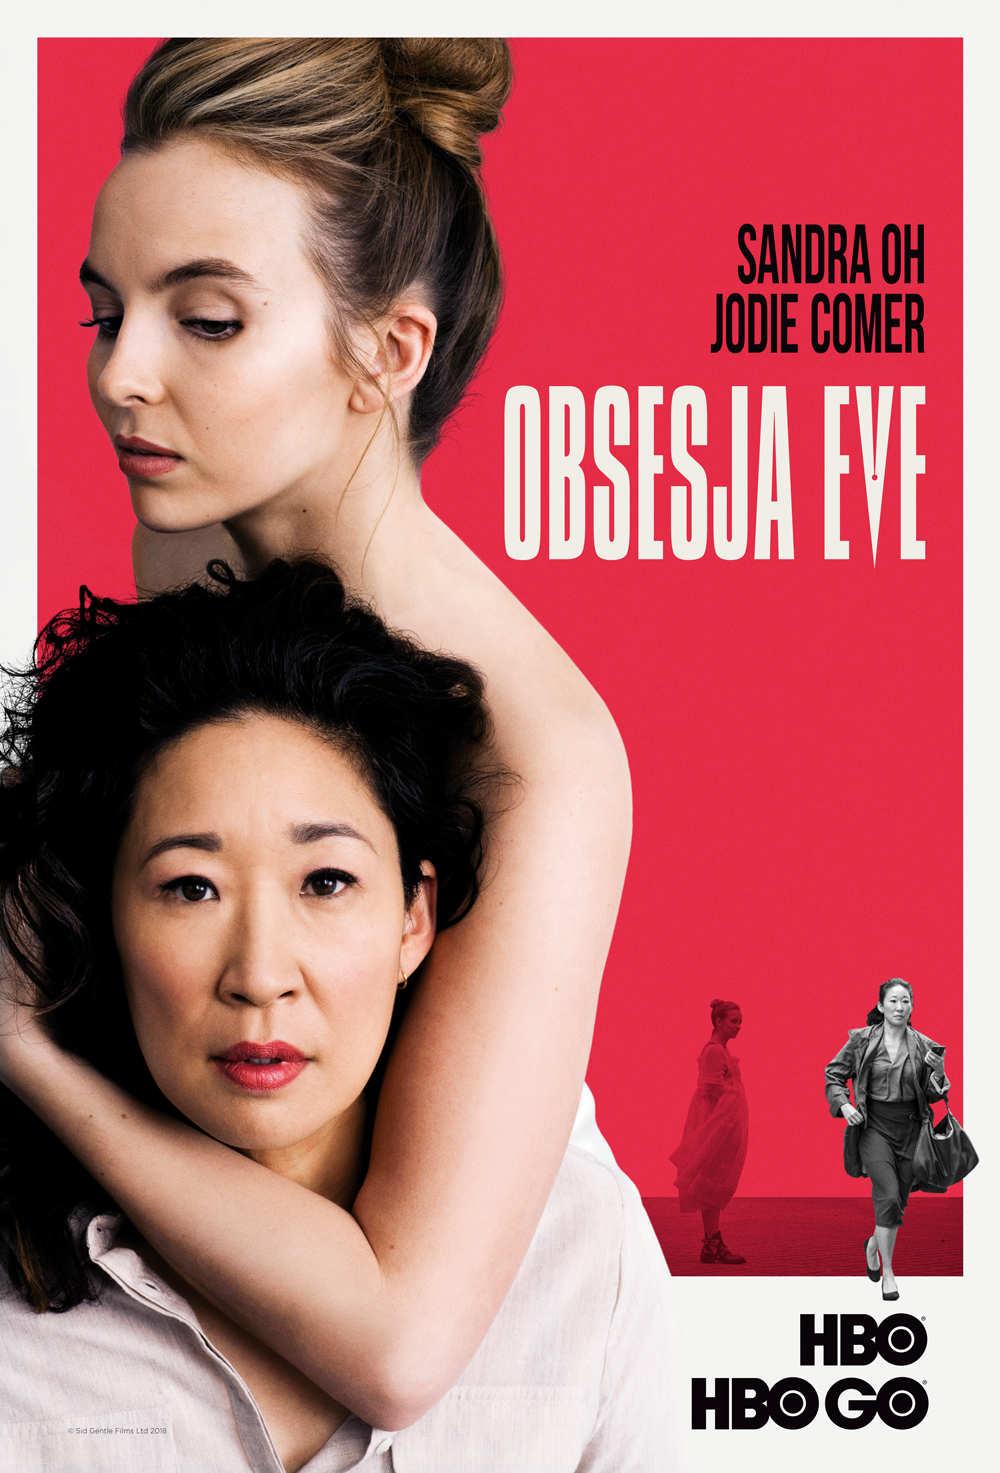 HBO Obsesja Eve plakat